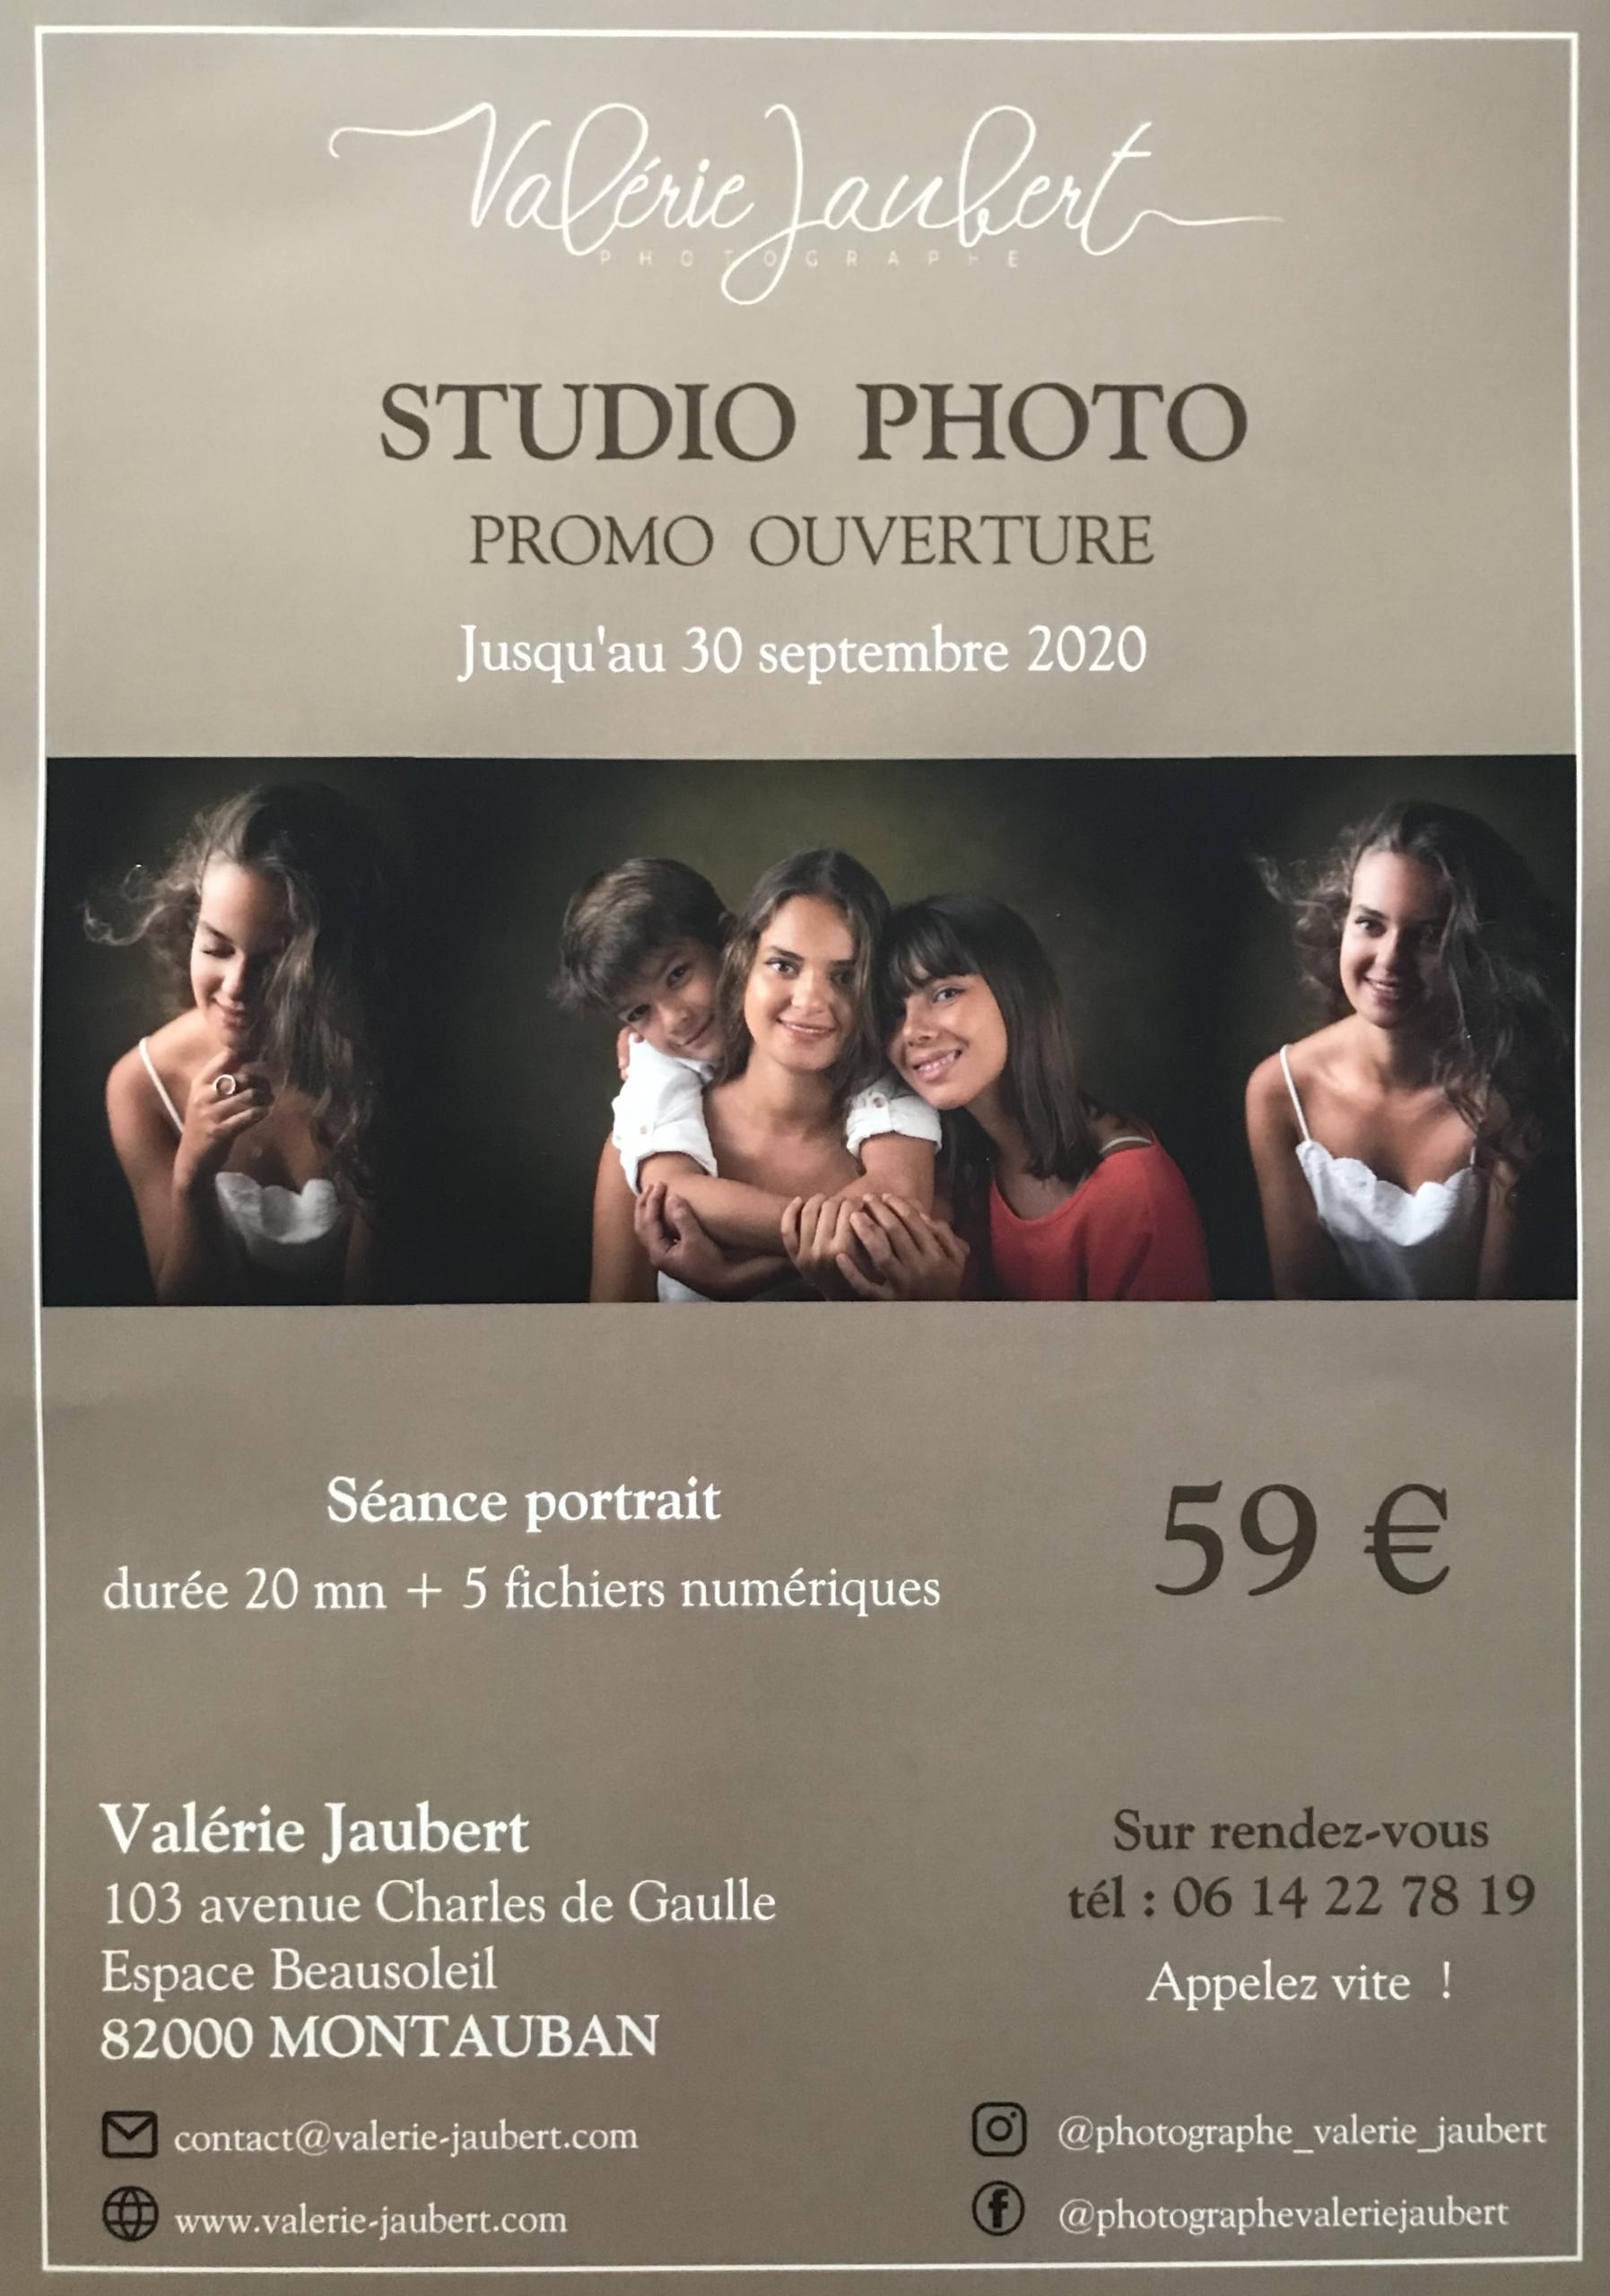 Tarif Promo ouverture studio photo